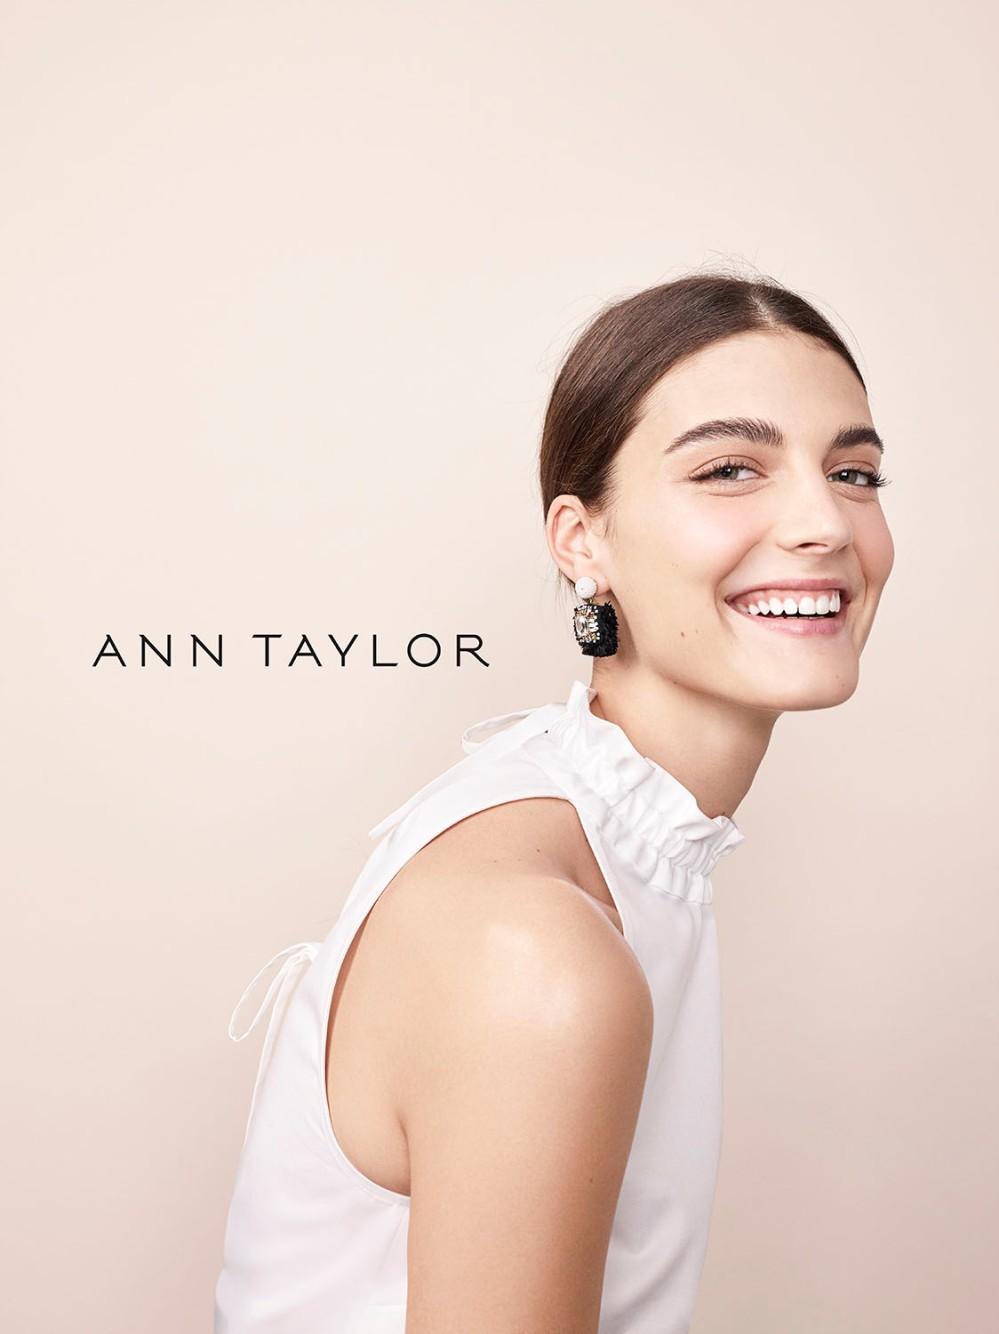 Ann Taylor_MEI TAO_Thomas Treuhaft_April17_Dresses_Fashion Photography 2